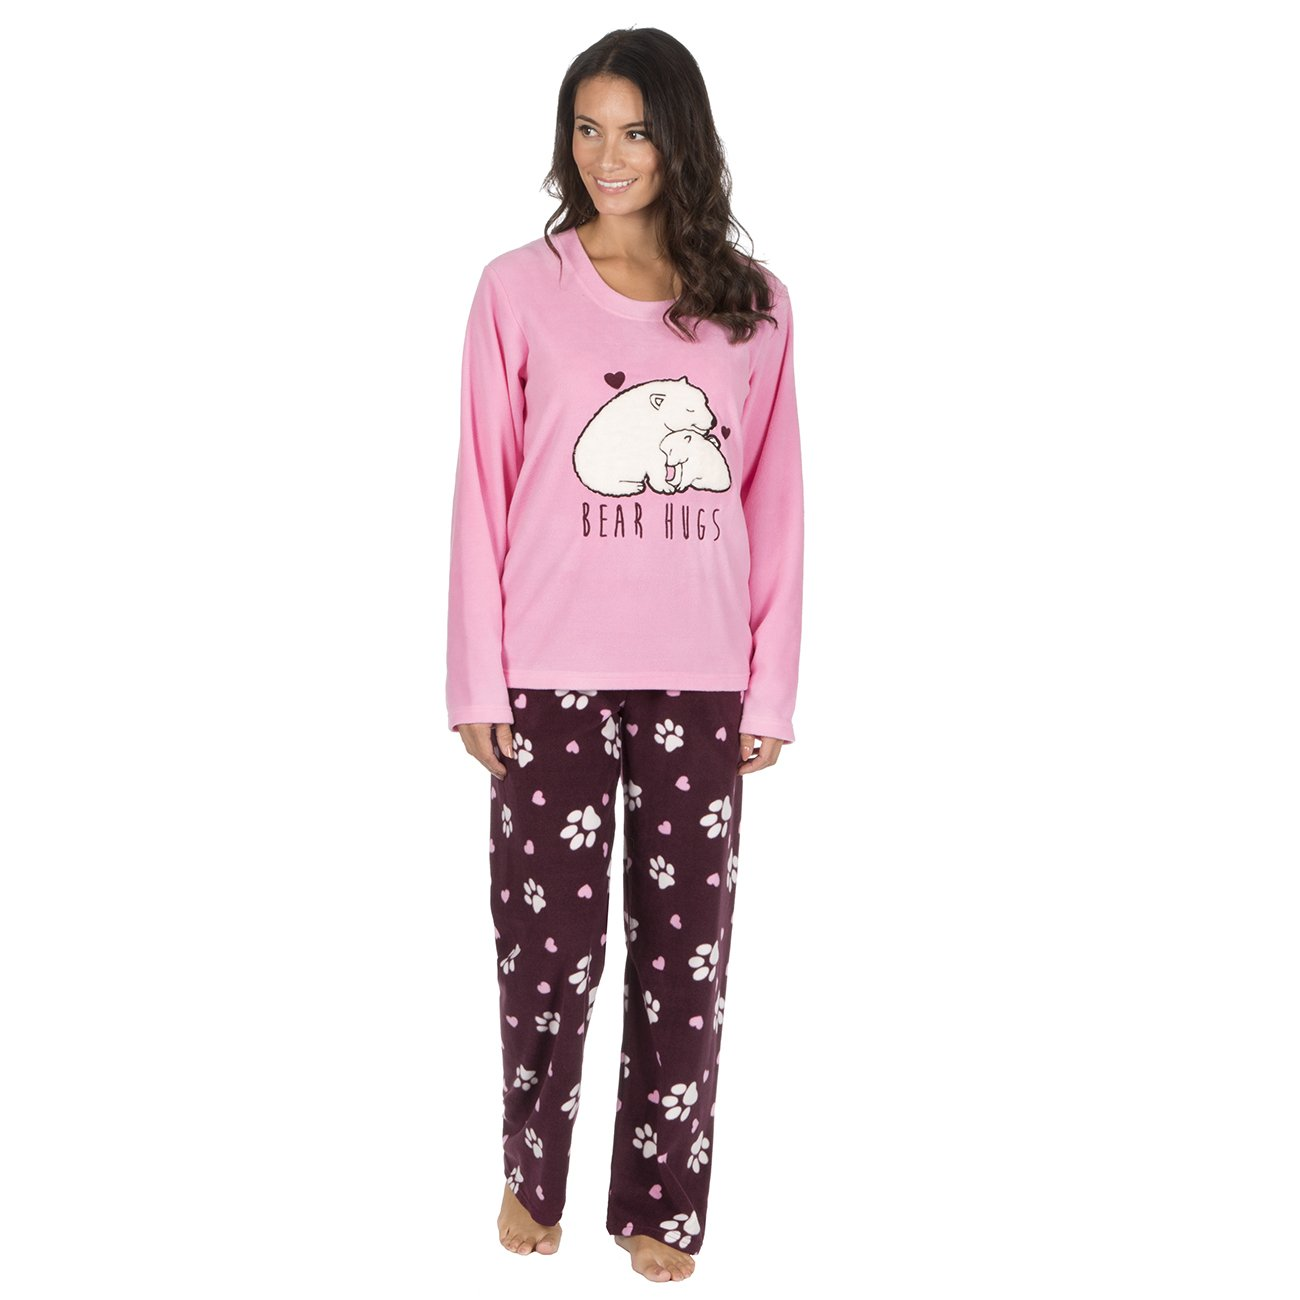 18b4529ab5 Forever Dreaming Ladies Novelty Soft Warm Micro Fleece PJ Animal Pyjama  Twosie  Amazon.co.uk  Clothing